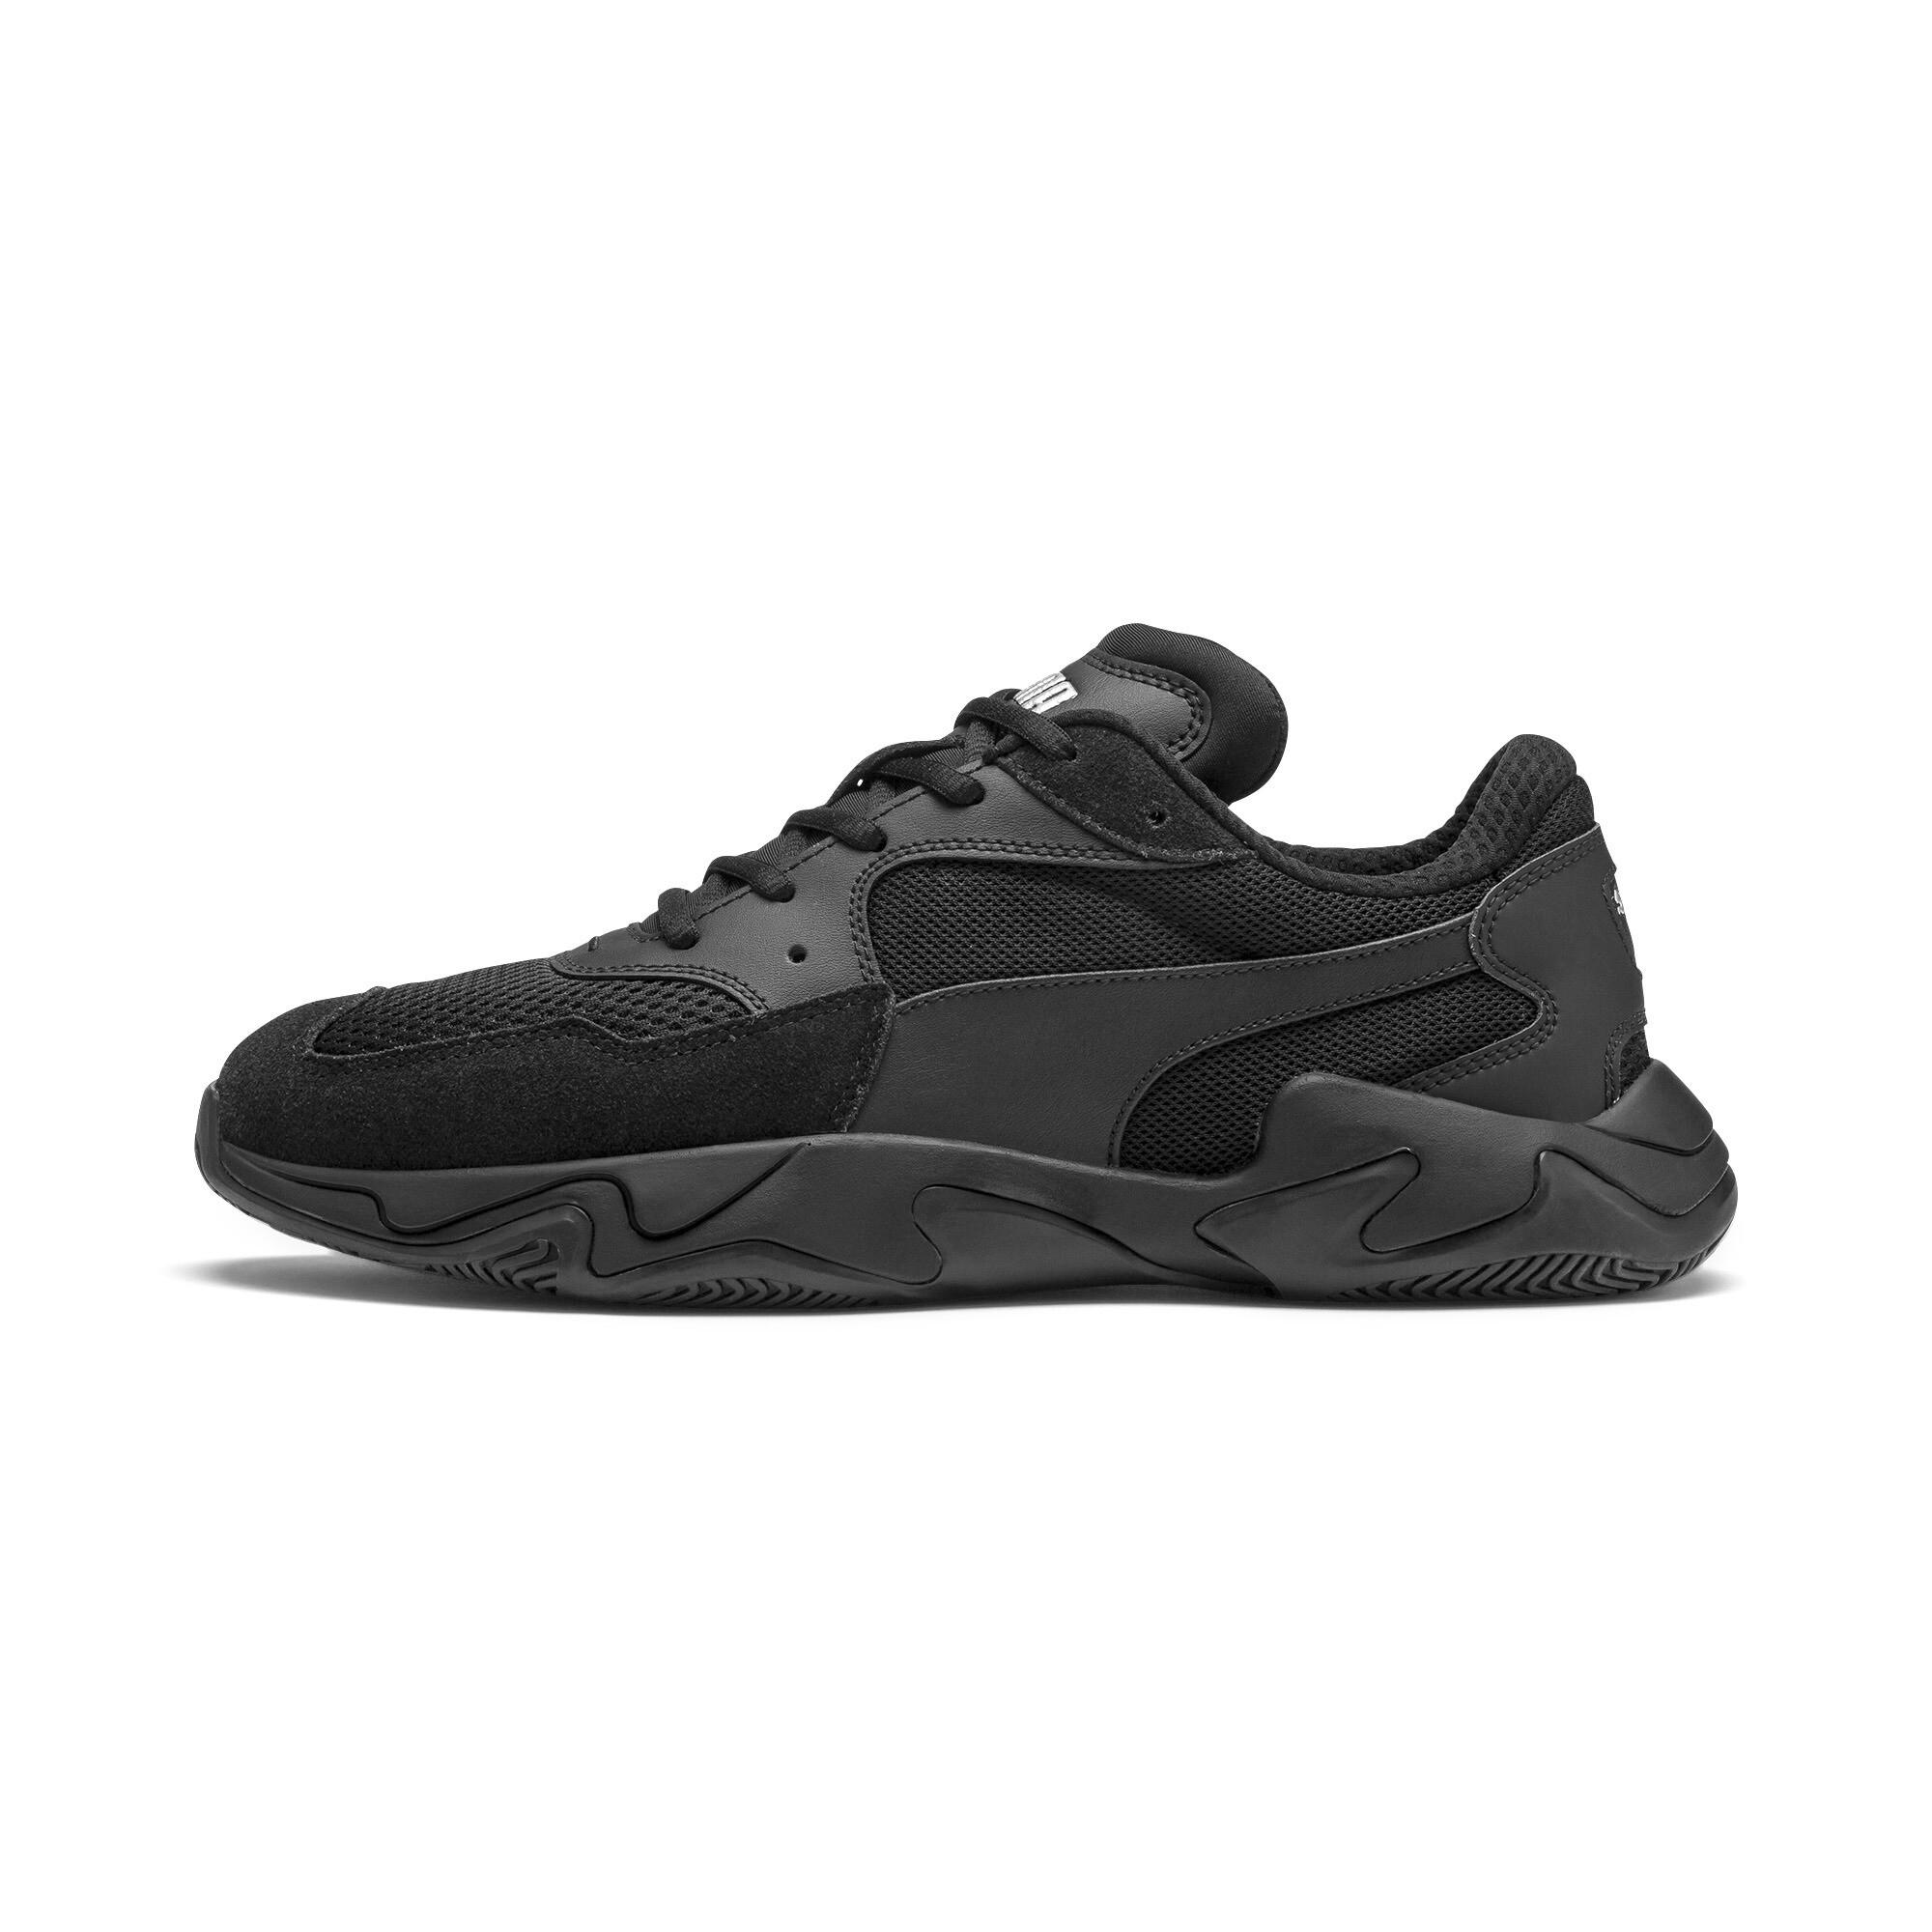 PUMA-Storm-Origin-Sneakers-Unisex-Shoe-Evolution thumbnail 4